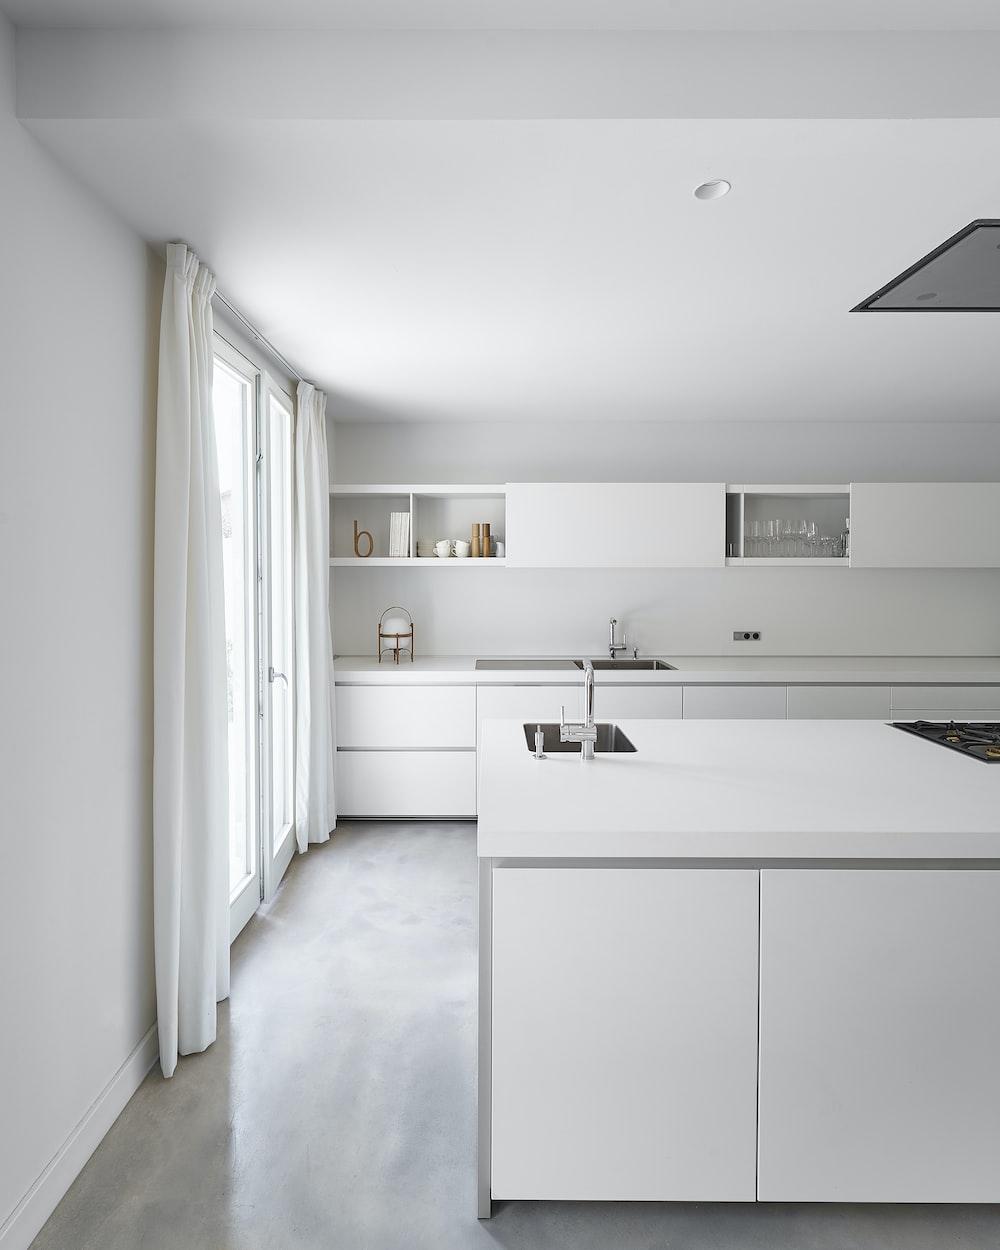 white wooden kitchen cabinet near white wall